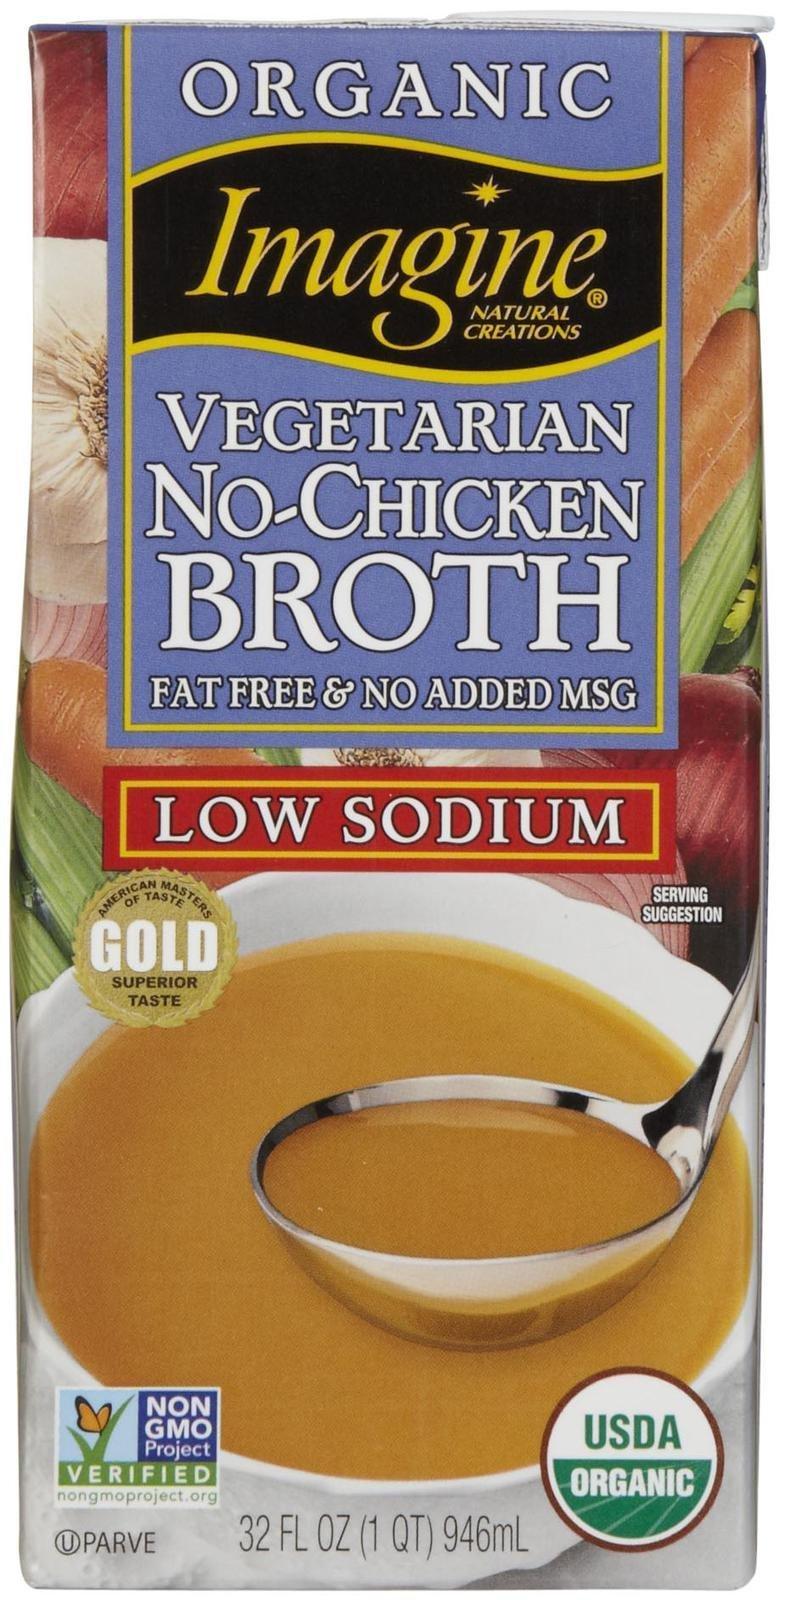 Imagine Organic No Chicken Broth, Low Sodium, 32 oz by Imagine